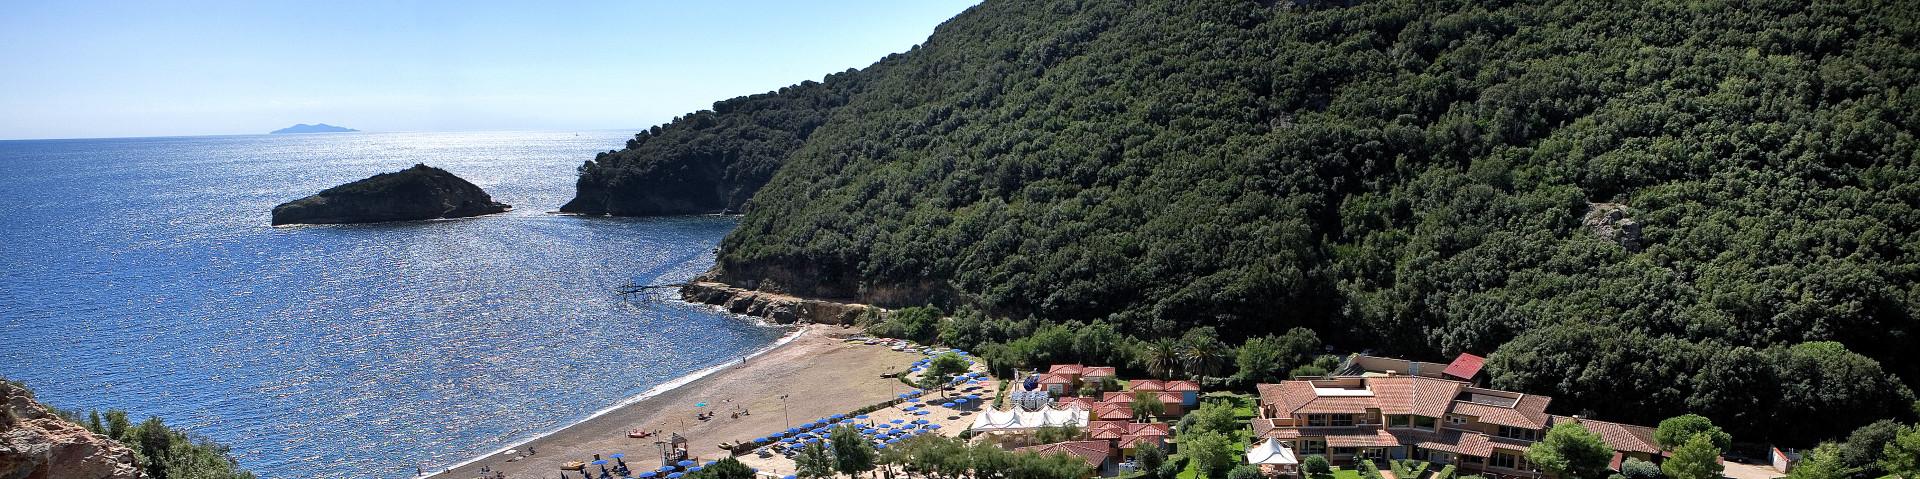 Elba, Rio Marina, v údolí Ortano Mare